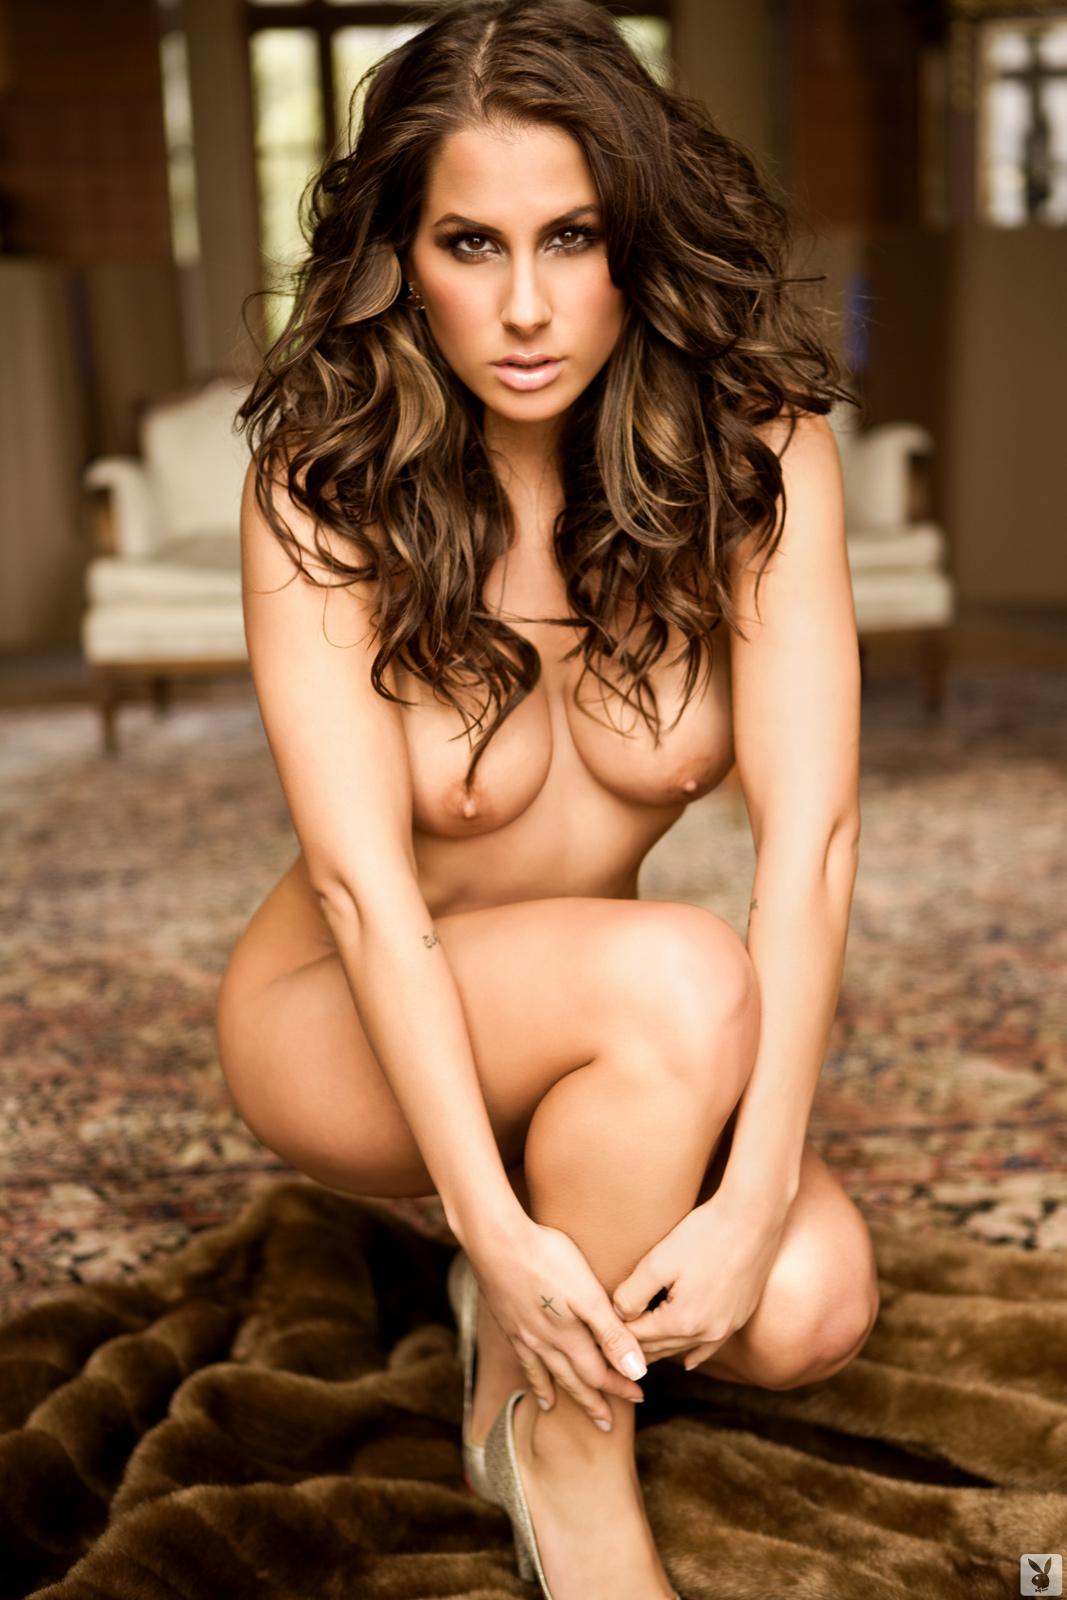 Solo nudes in briefs